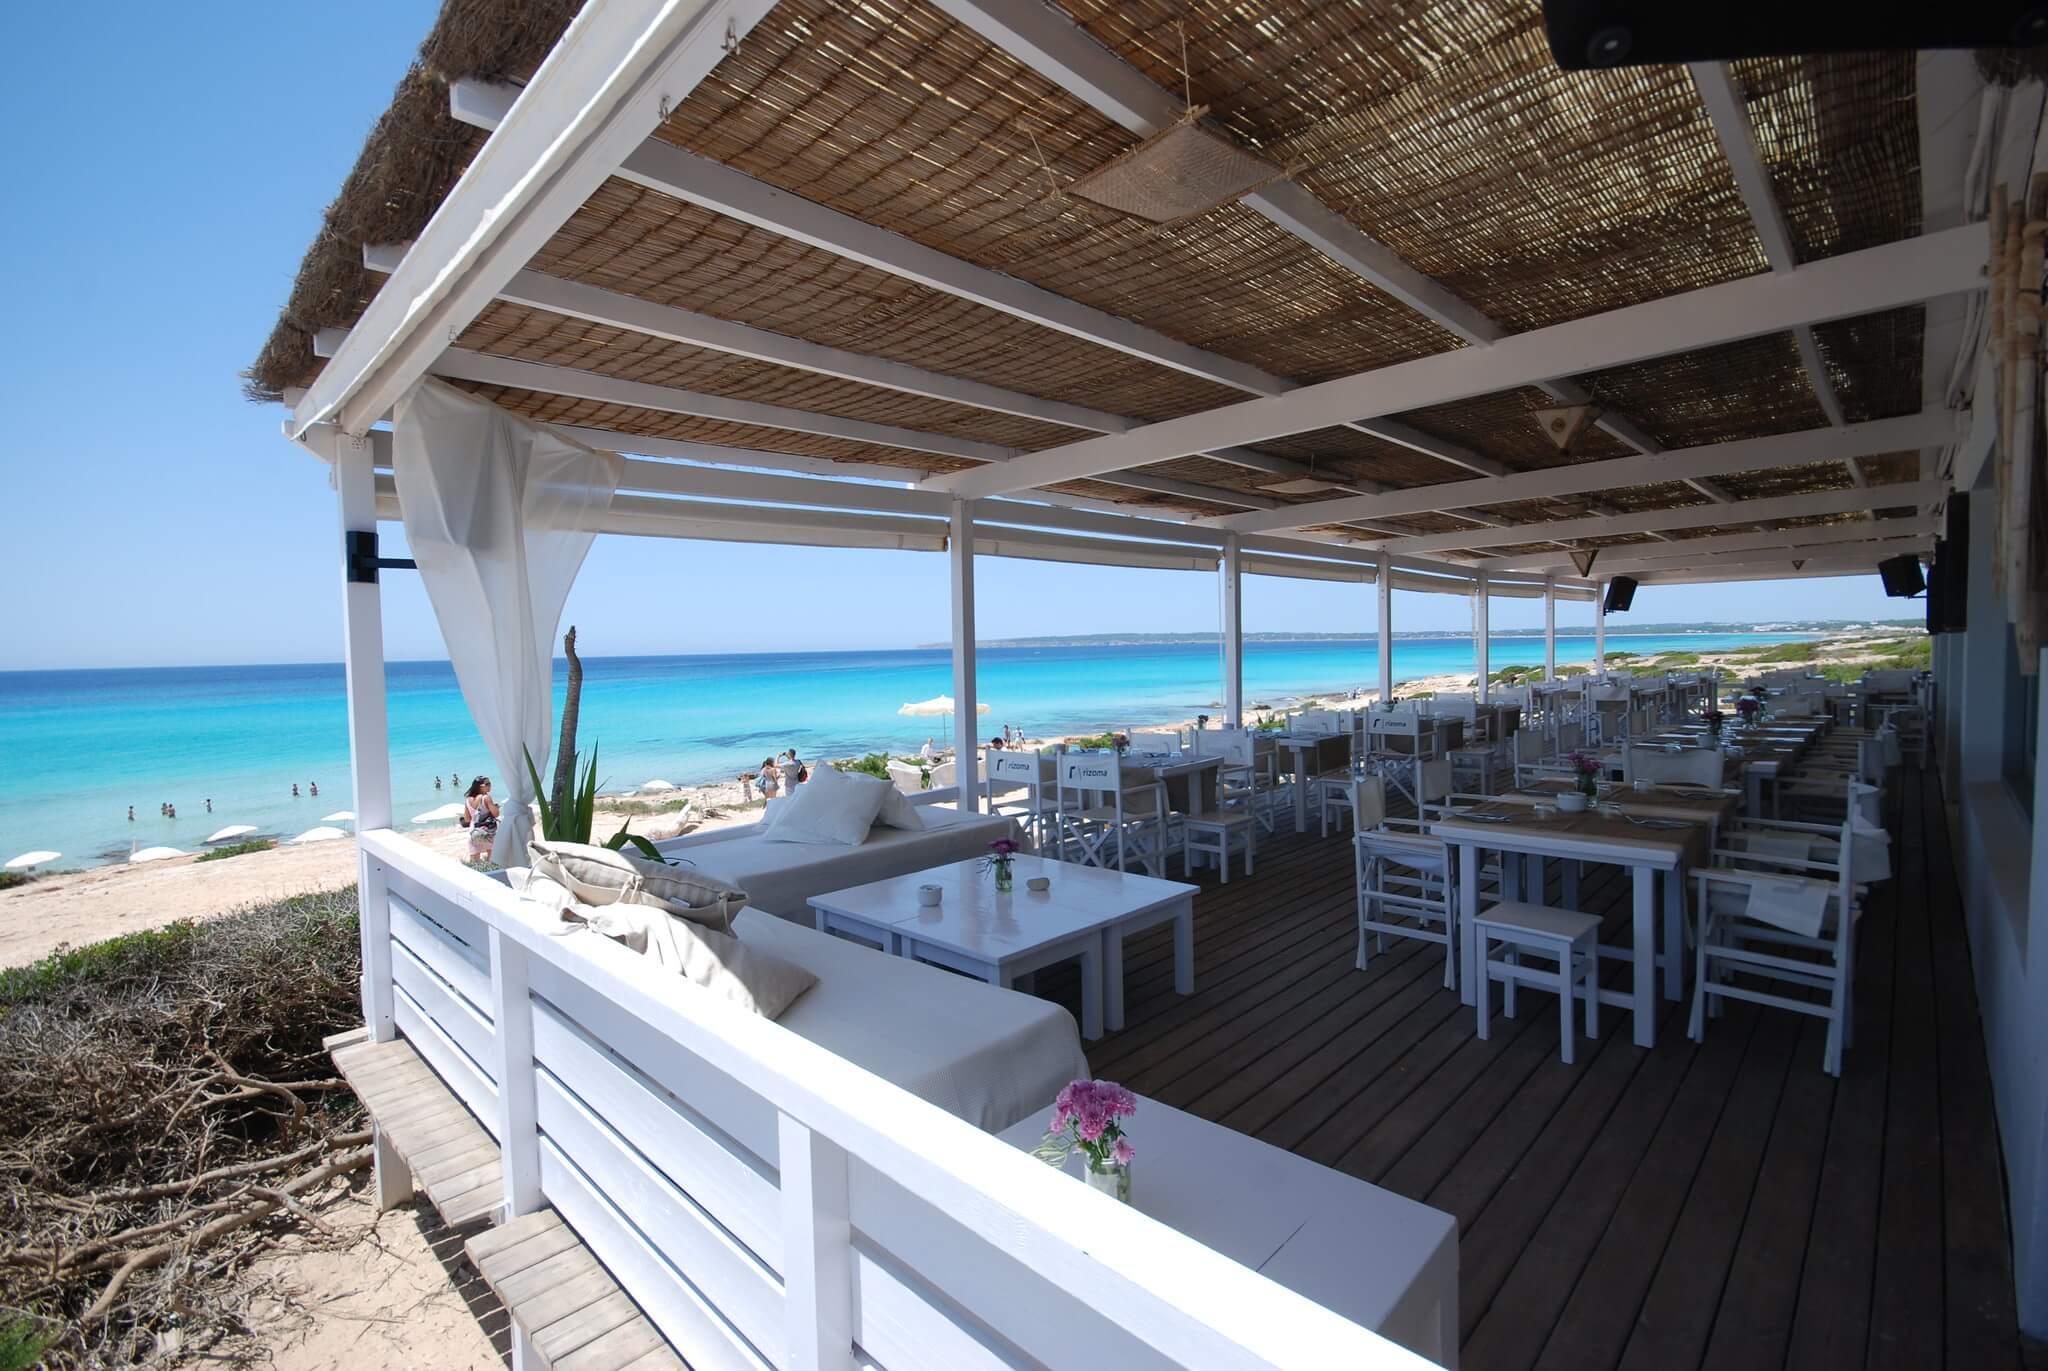 https://www.white-ibiza.com/wp-content/uploads/2020/03/formentera-beach-restaurants-10-punto7-2020-05.jpg